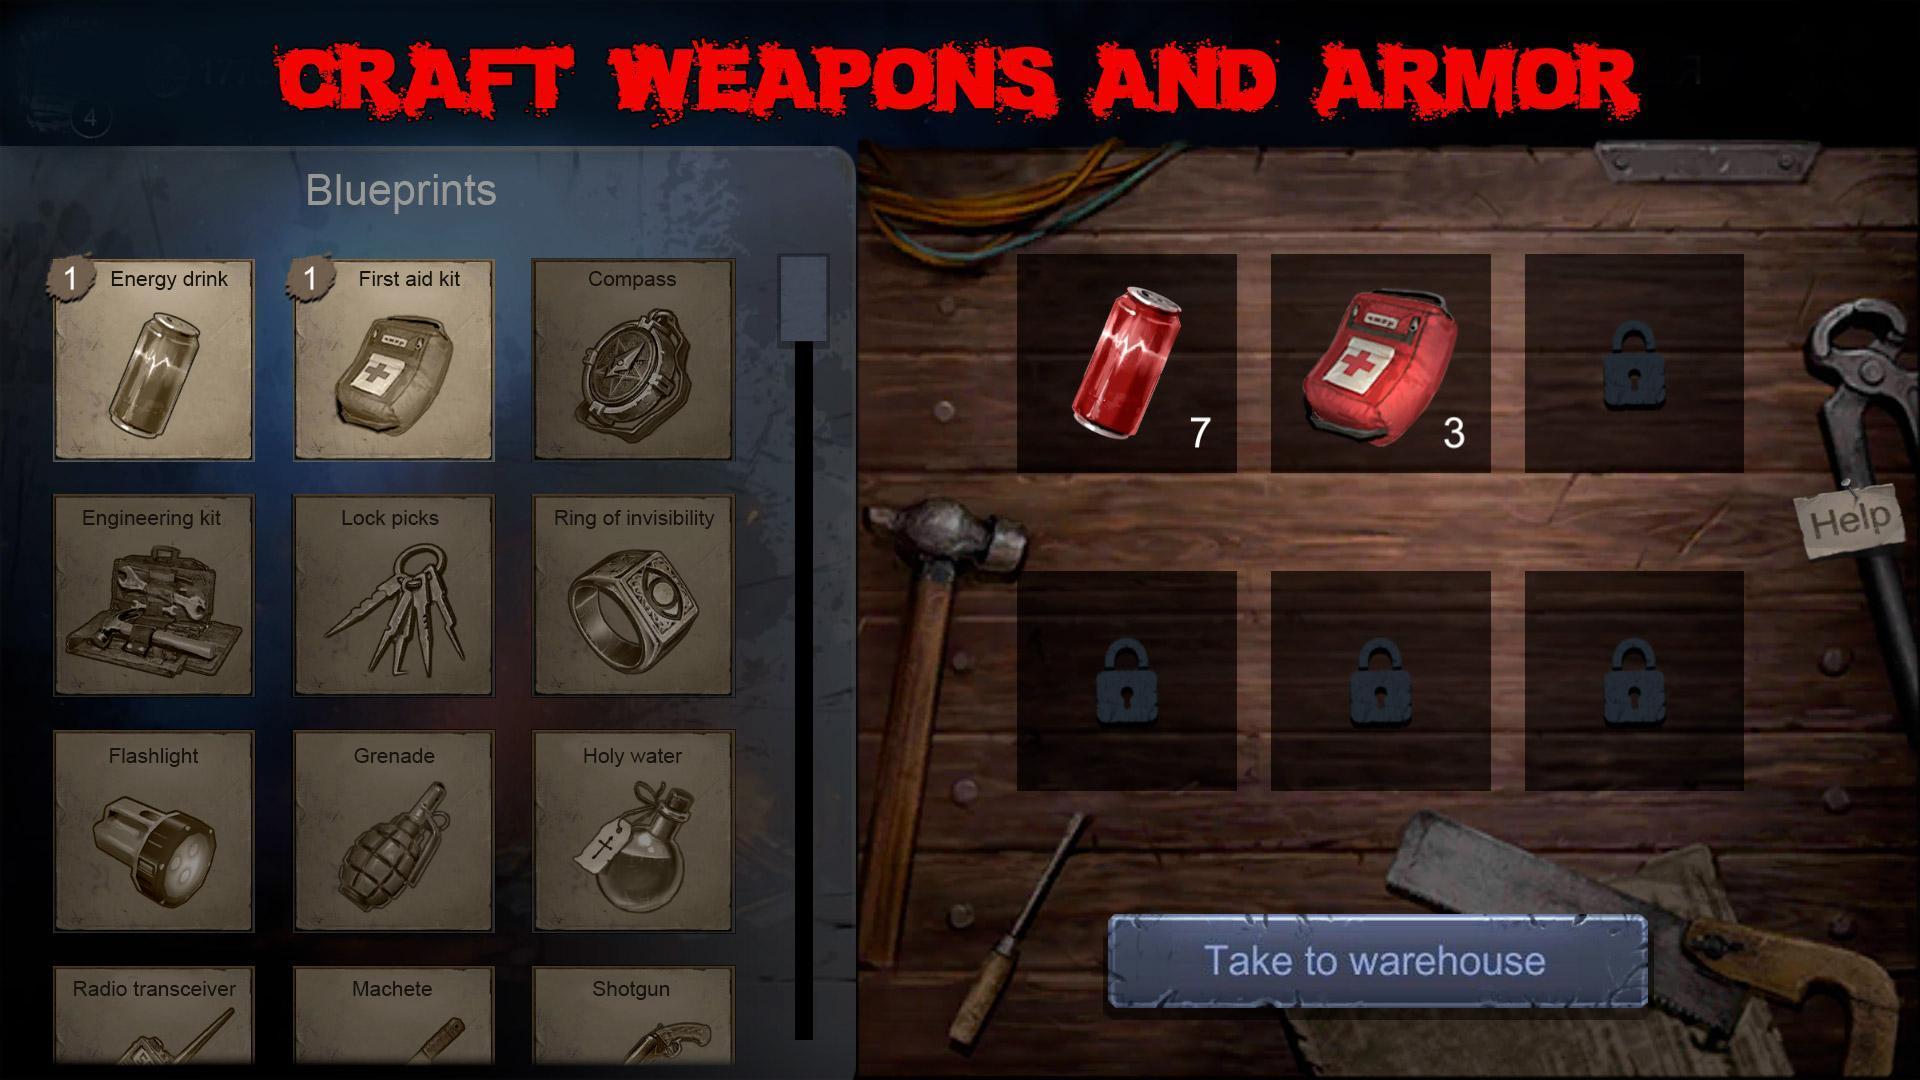 Horrorfield Multiplayer Survival Horror Game 1.3.6 Screenshot 4